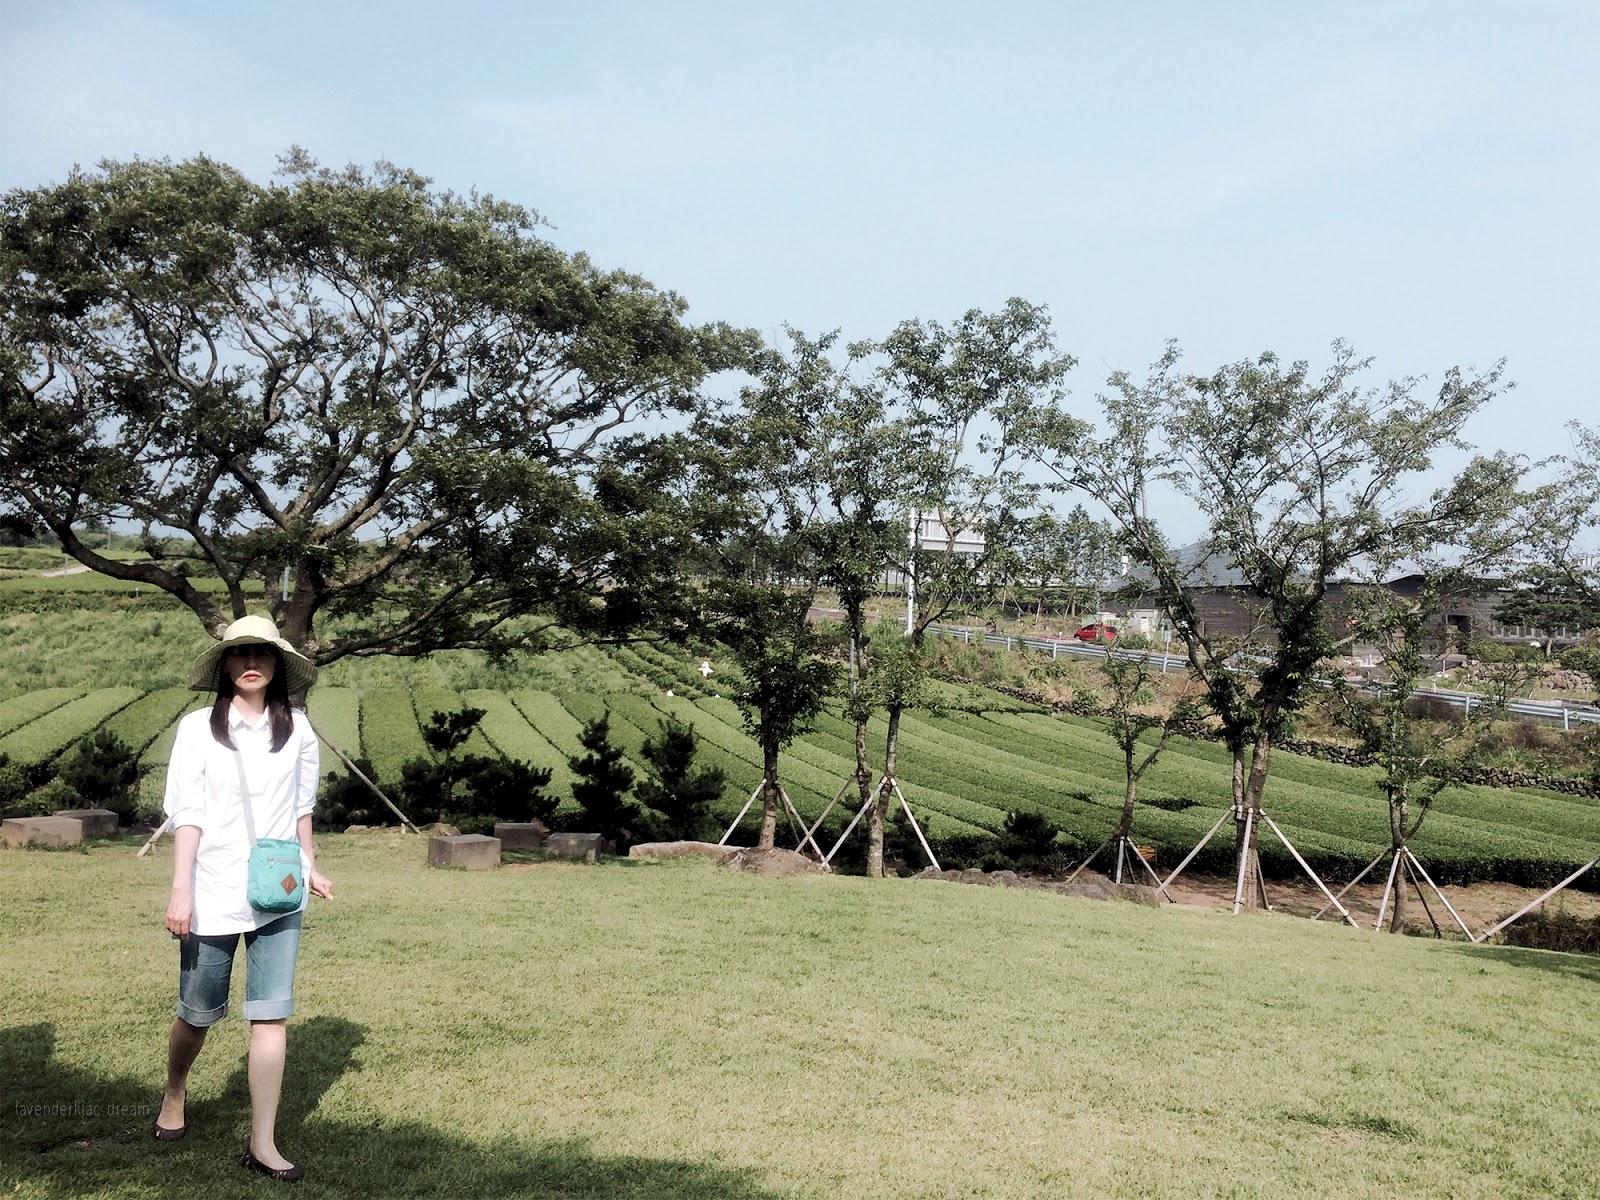 South Korea, Yonsei University, YISS 2014 Field Trip to Jeju Island, OSULLOC Tea Museum, Seogwang Tea Garden